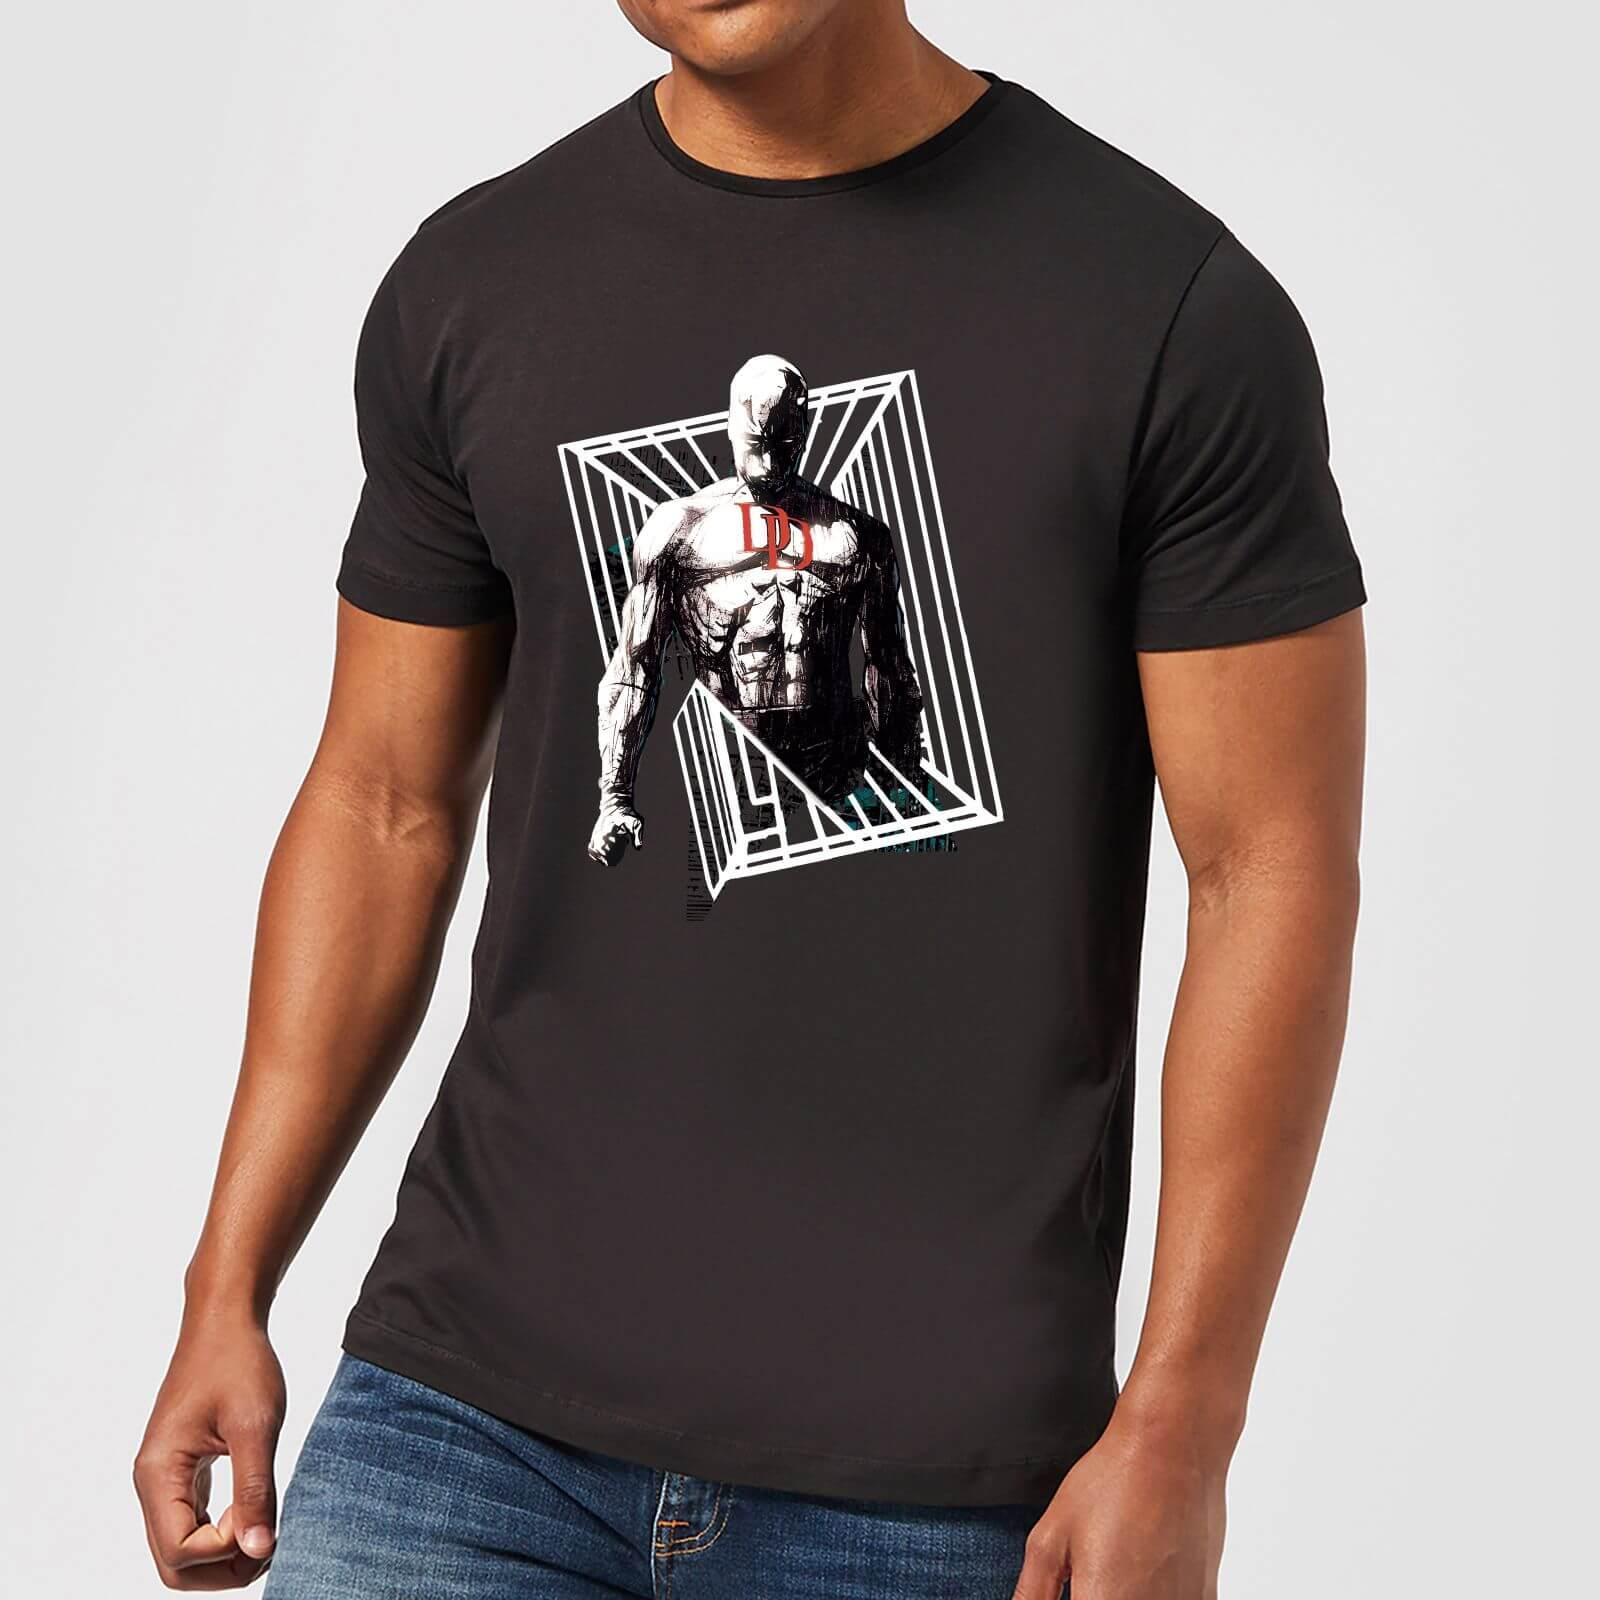 OfferteWeb.click 83-t-shirt-marvel-knights-daredevil-cage-nero-uomo-xxl